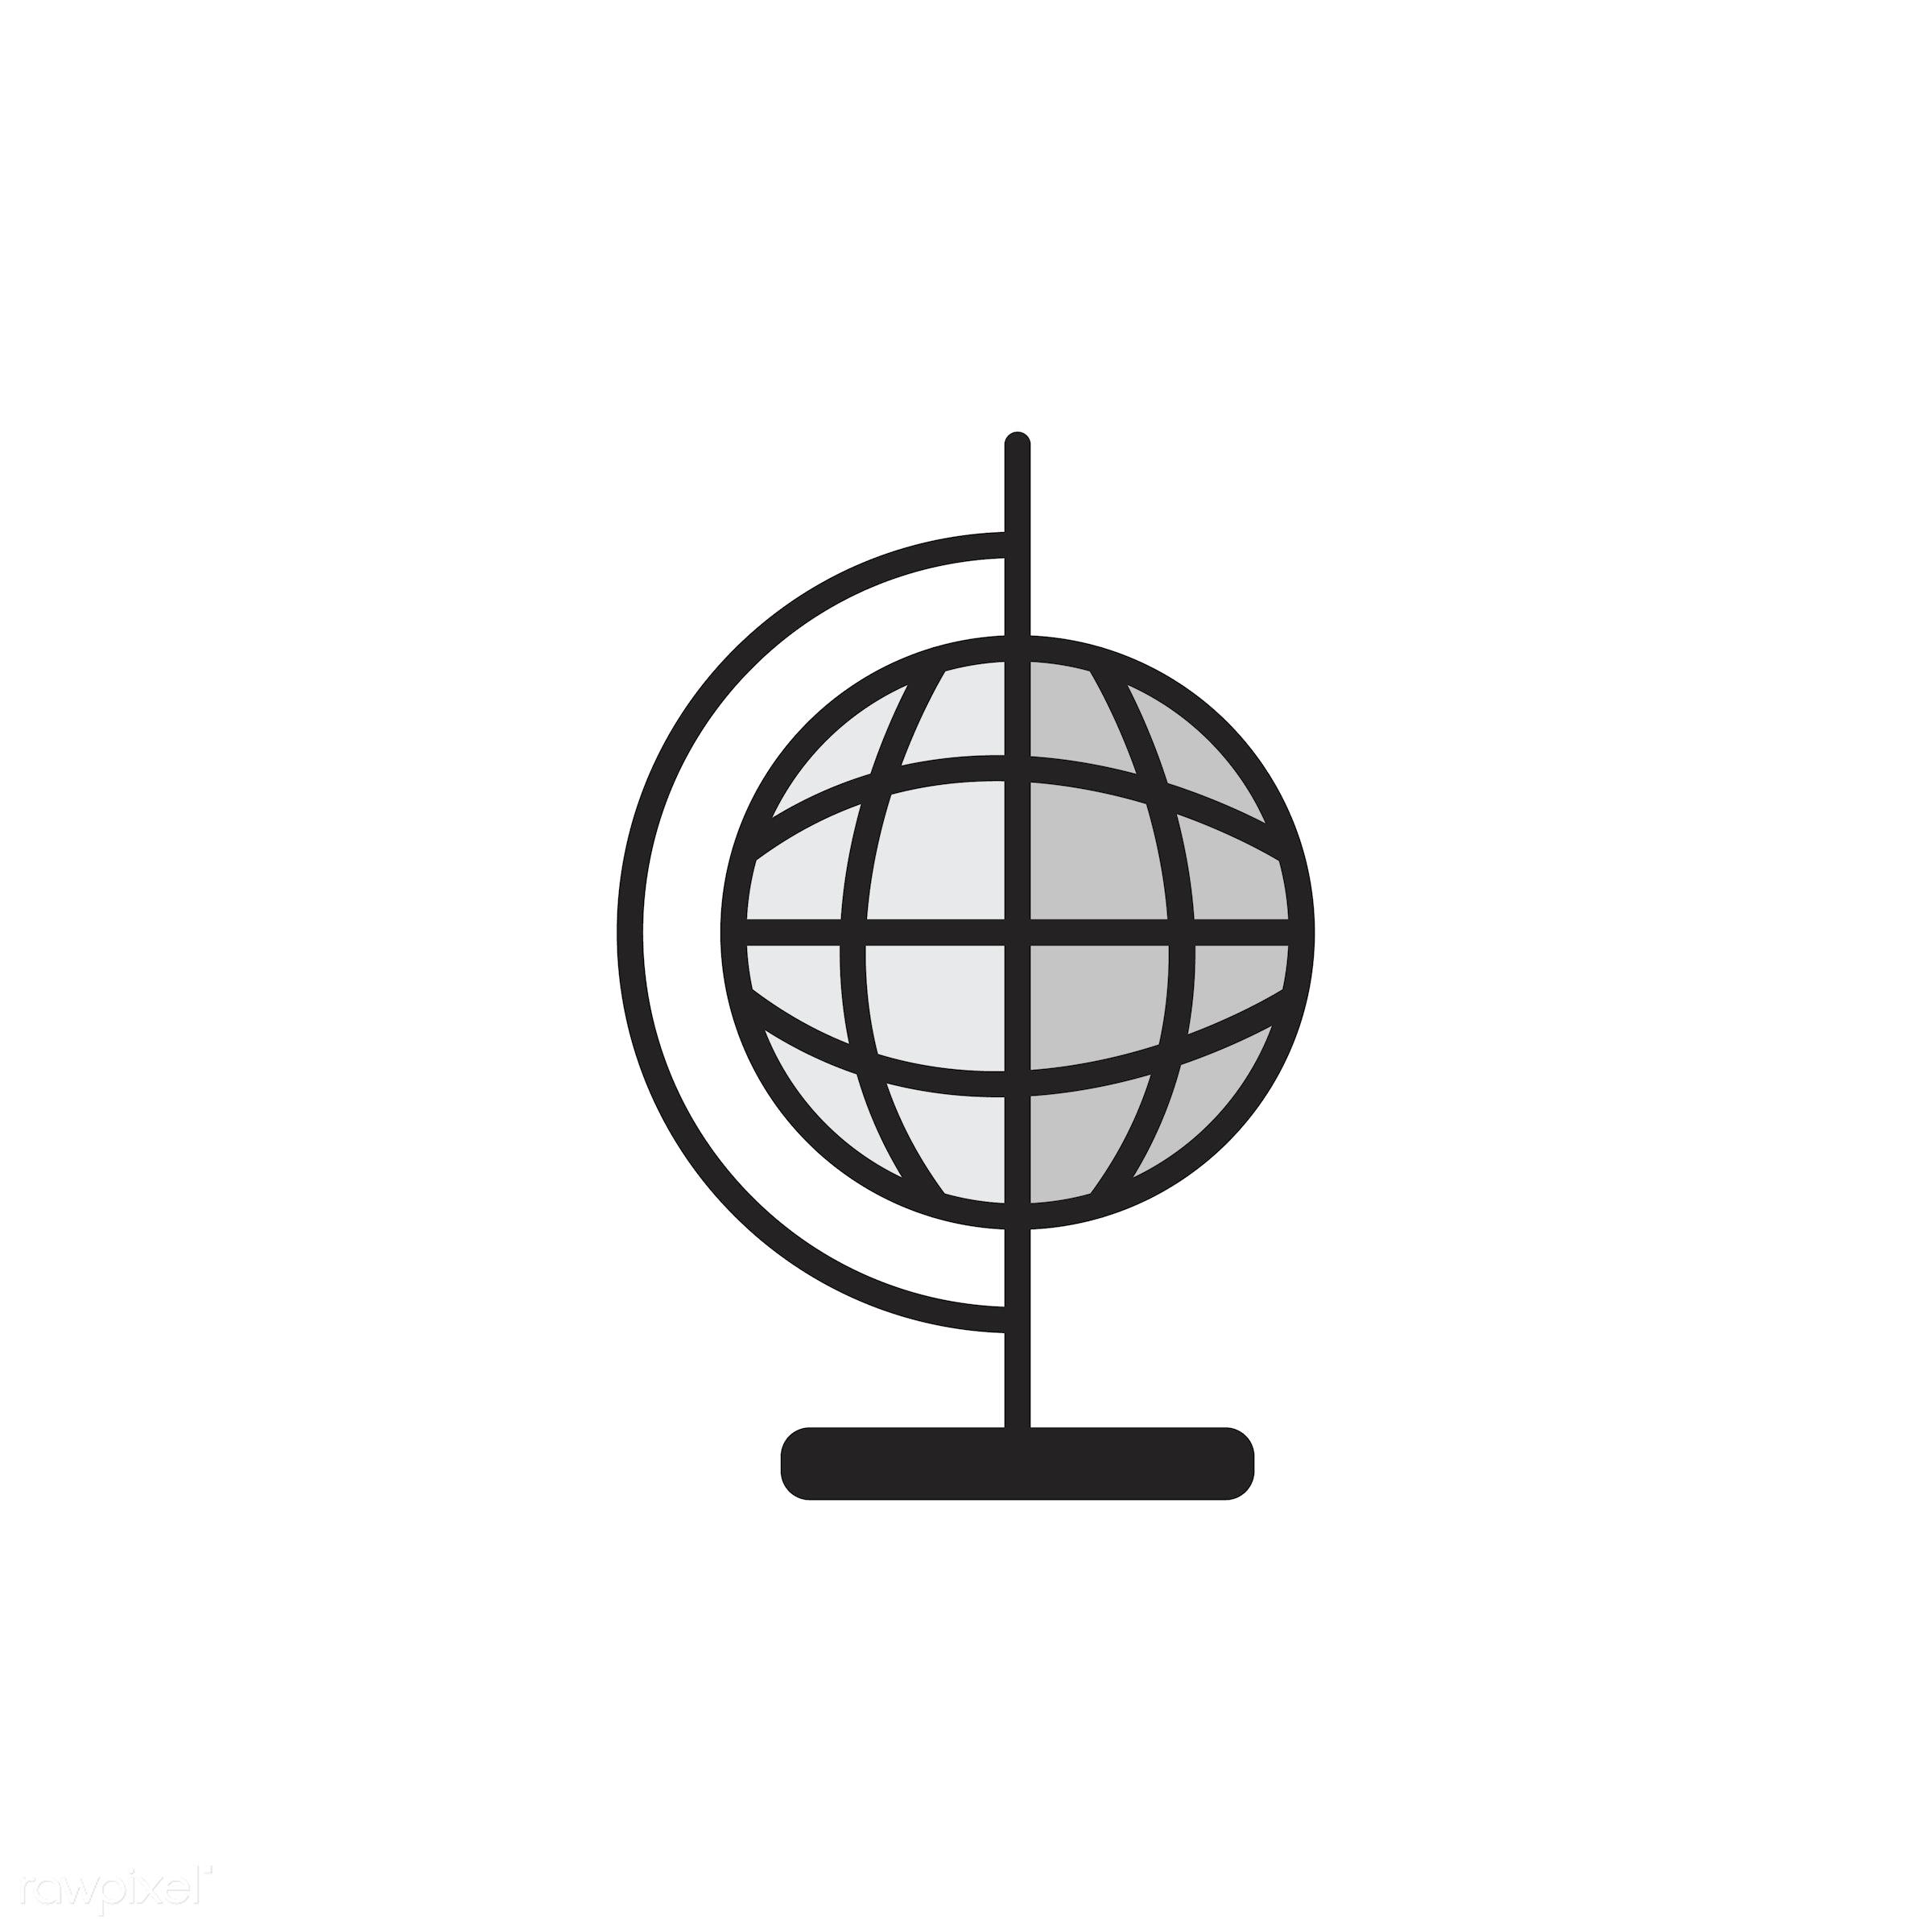 Illustration of globe ball - biology, chemistry, class, design, education, equipments, graphic, icon, illustration,...